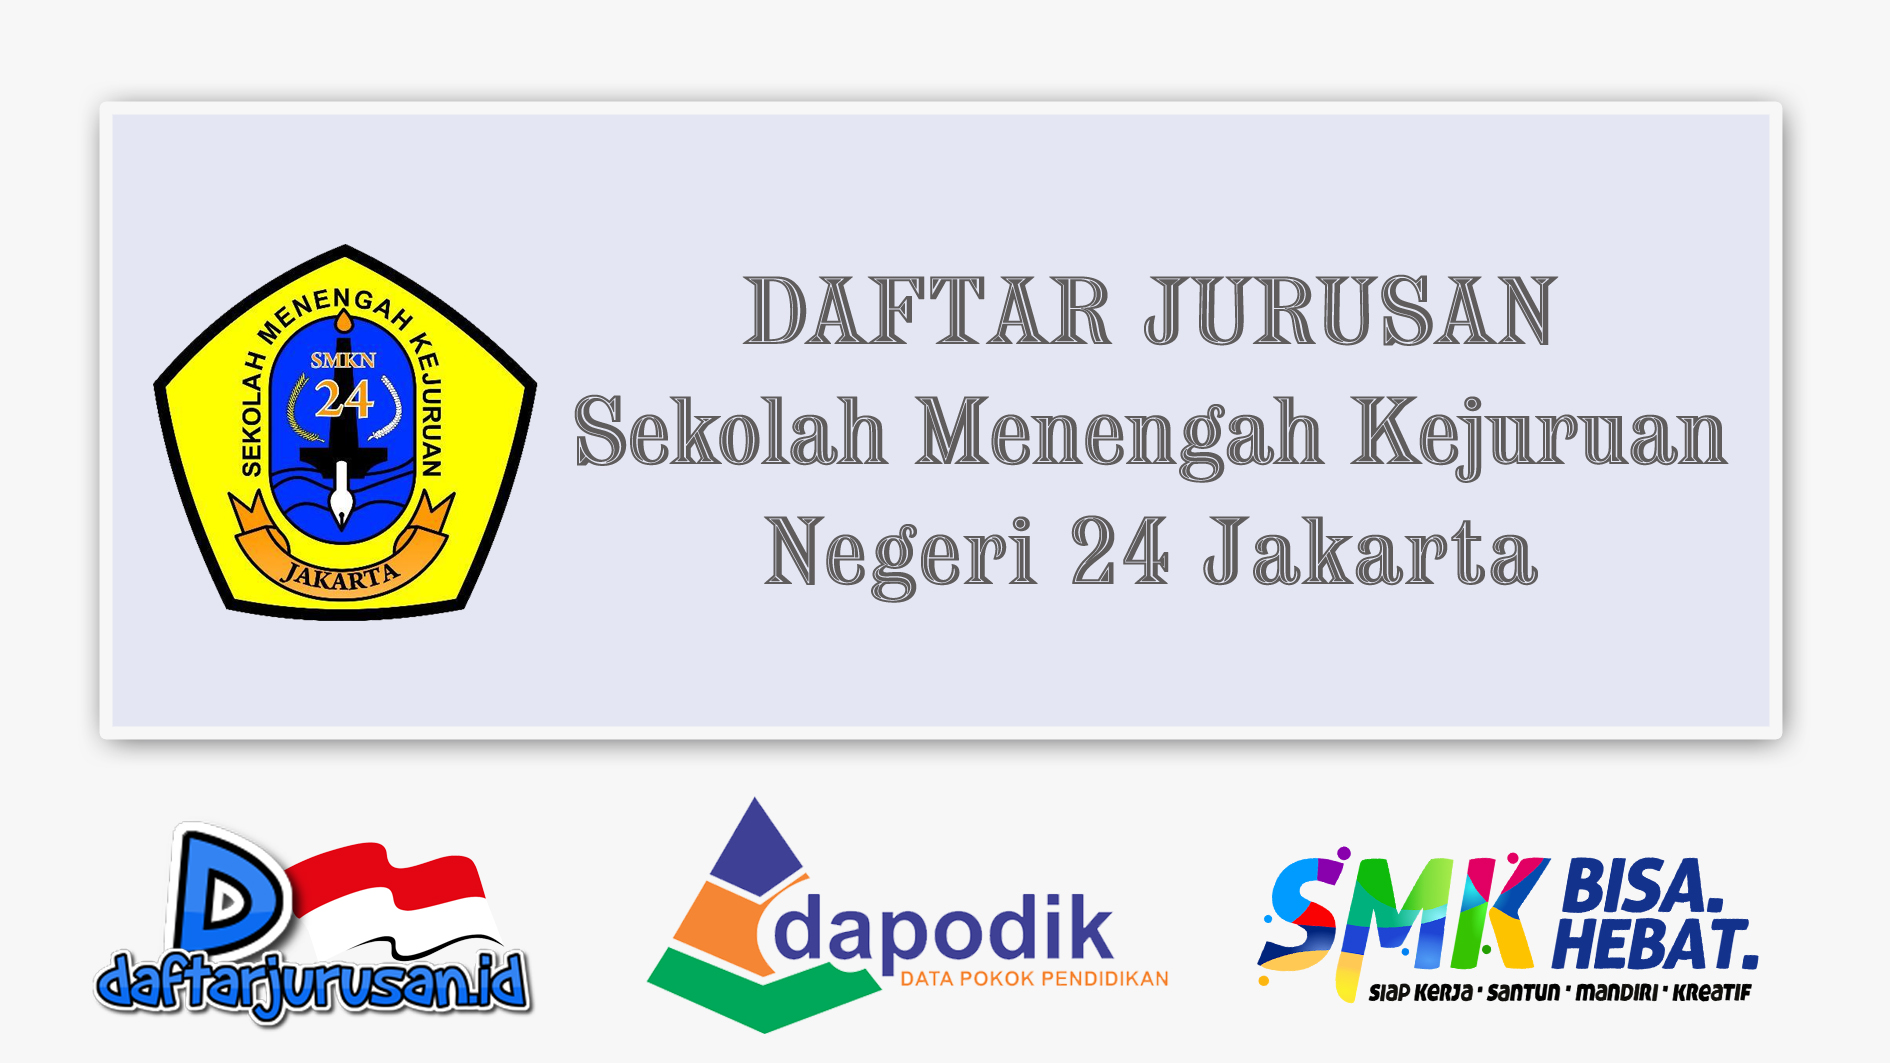 Daftar Jurusan SMK Negeri 24 Jakarta Timur